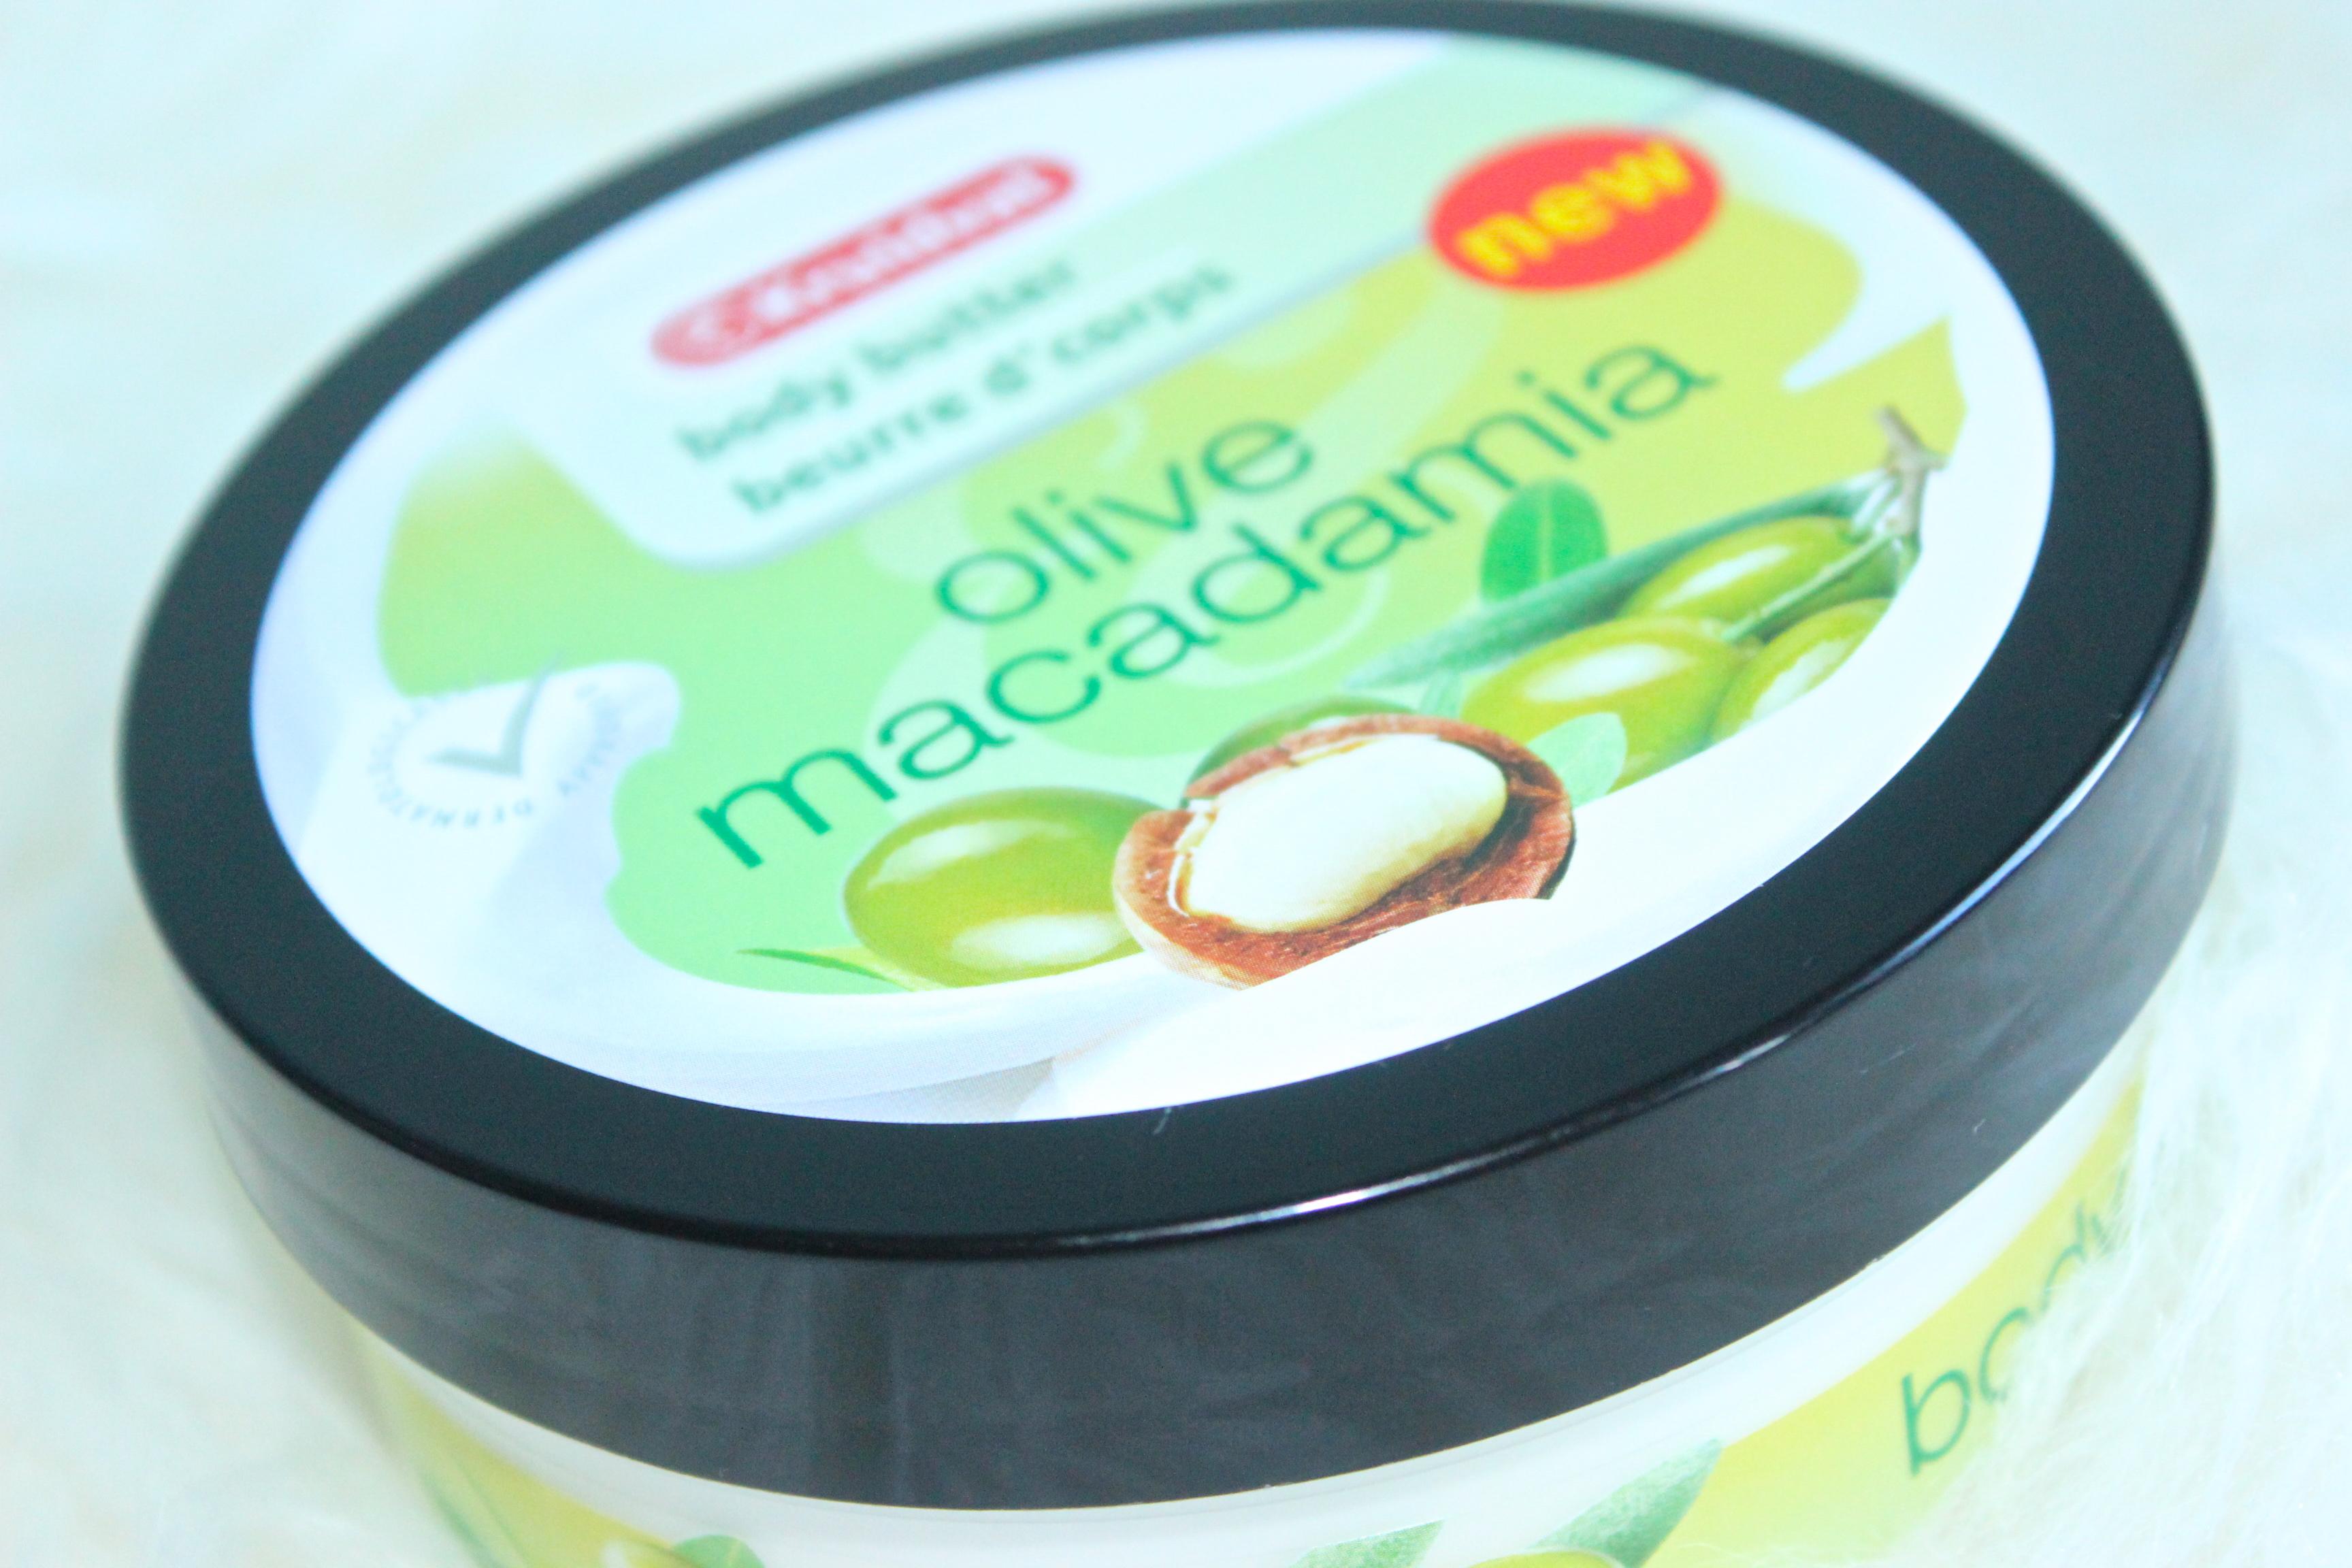 bdb77697ee6 Kruidvat body butter olive macadamia 1 Kruidvat body butter olive macadamia  2